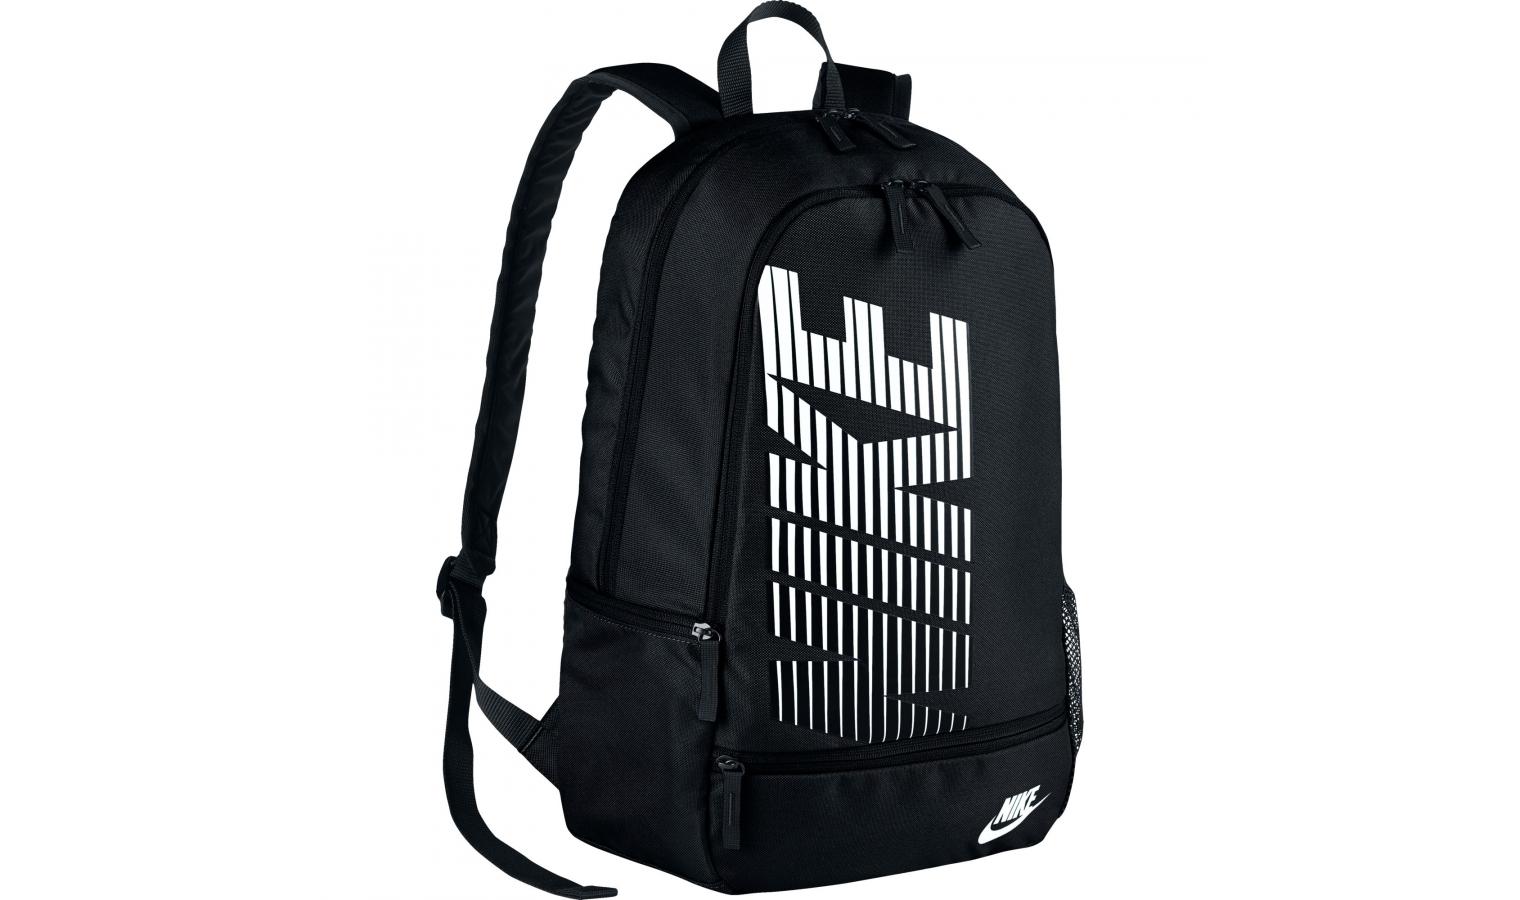 f2ed7a8bc Batoh Nike CLASSIC NORTH černé | AD Sport.cz